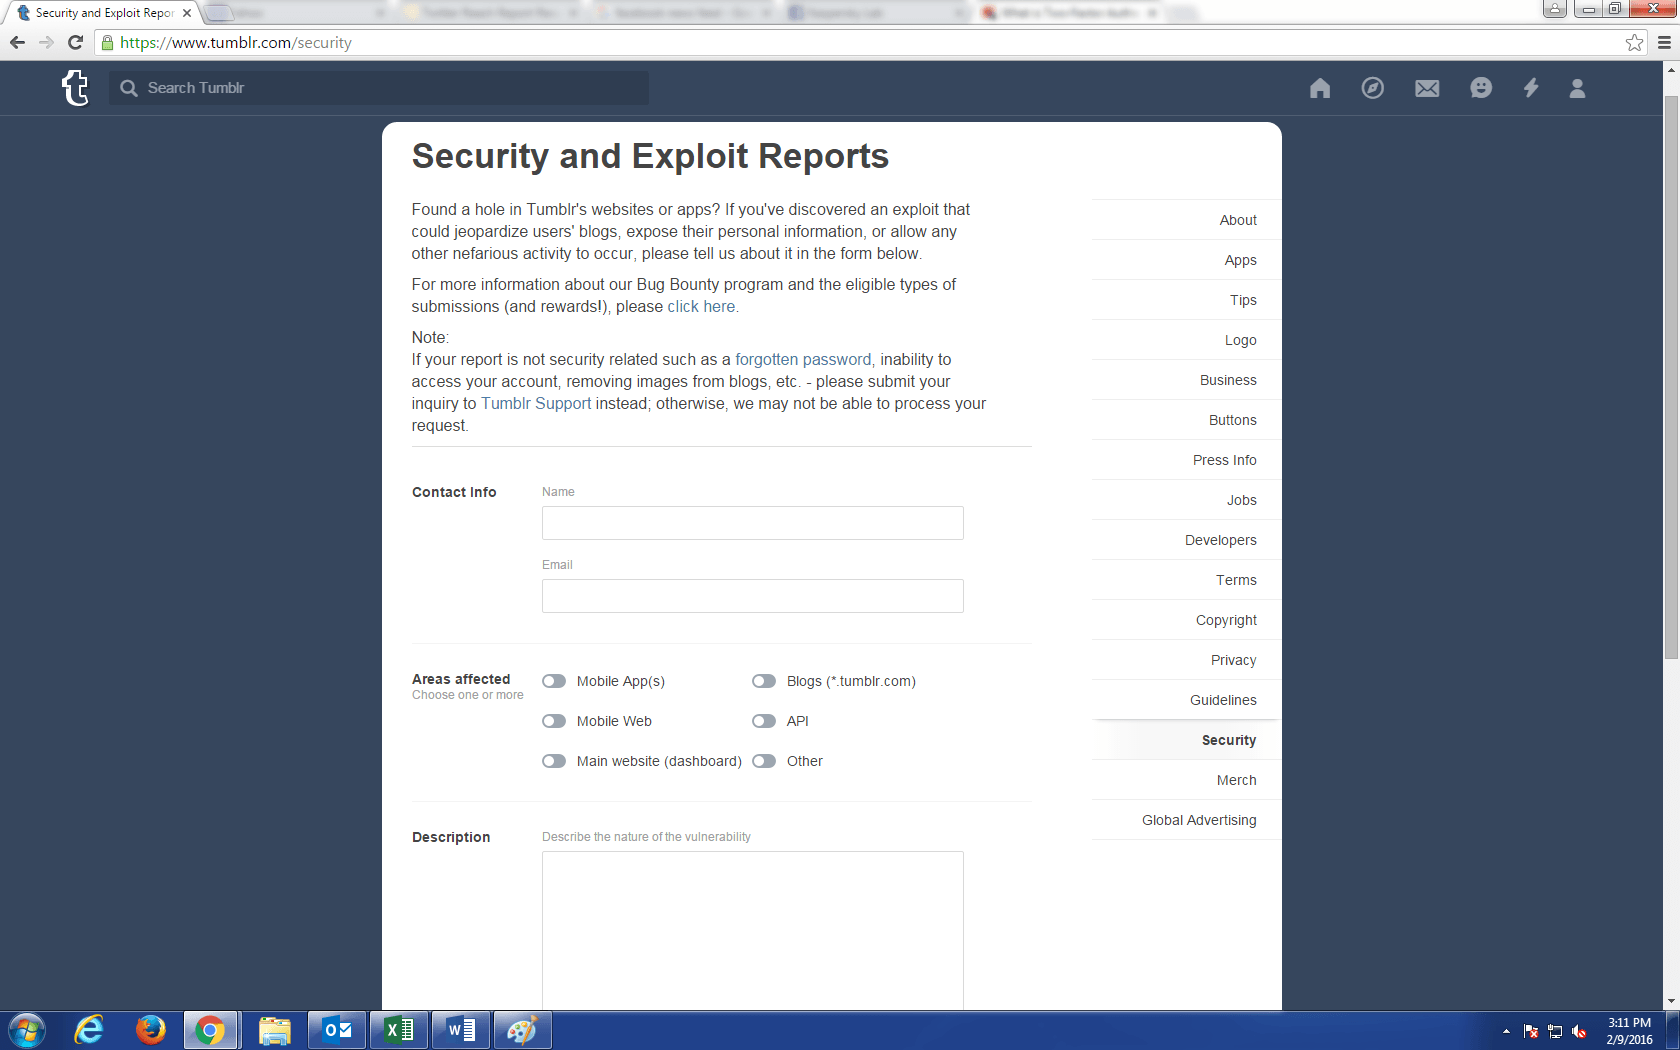 Tumblr security page screenshot